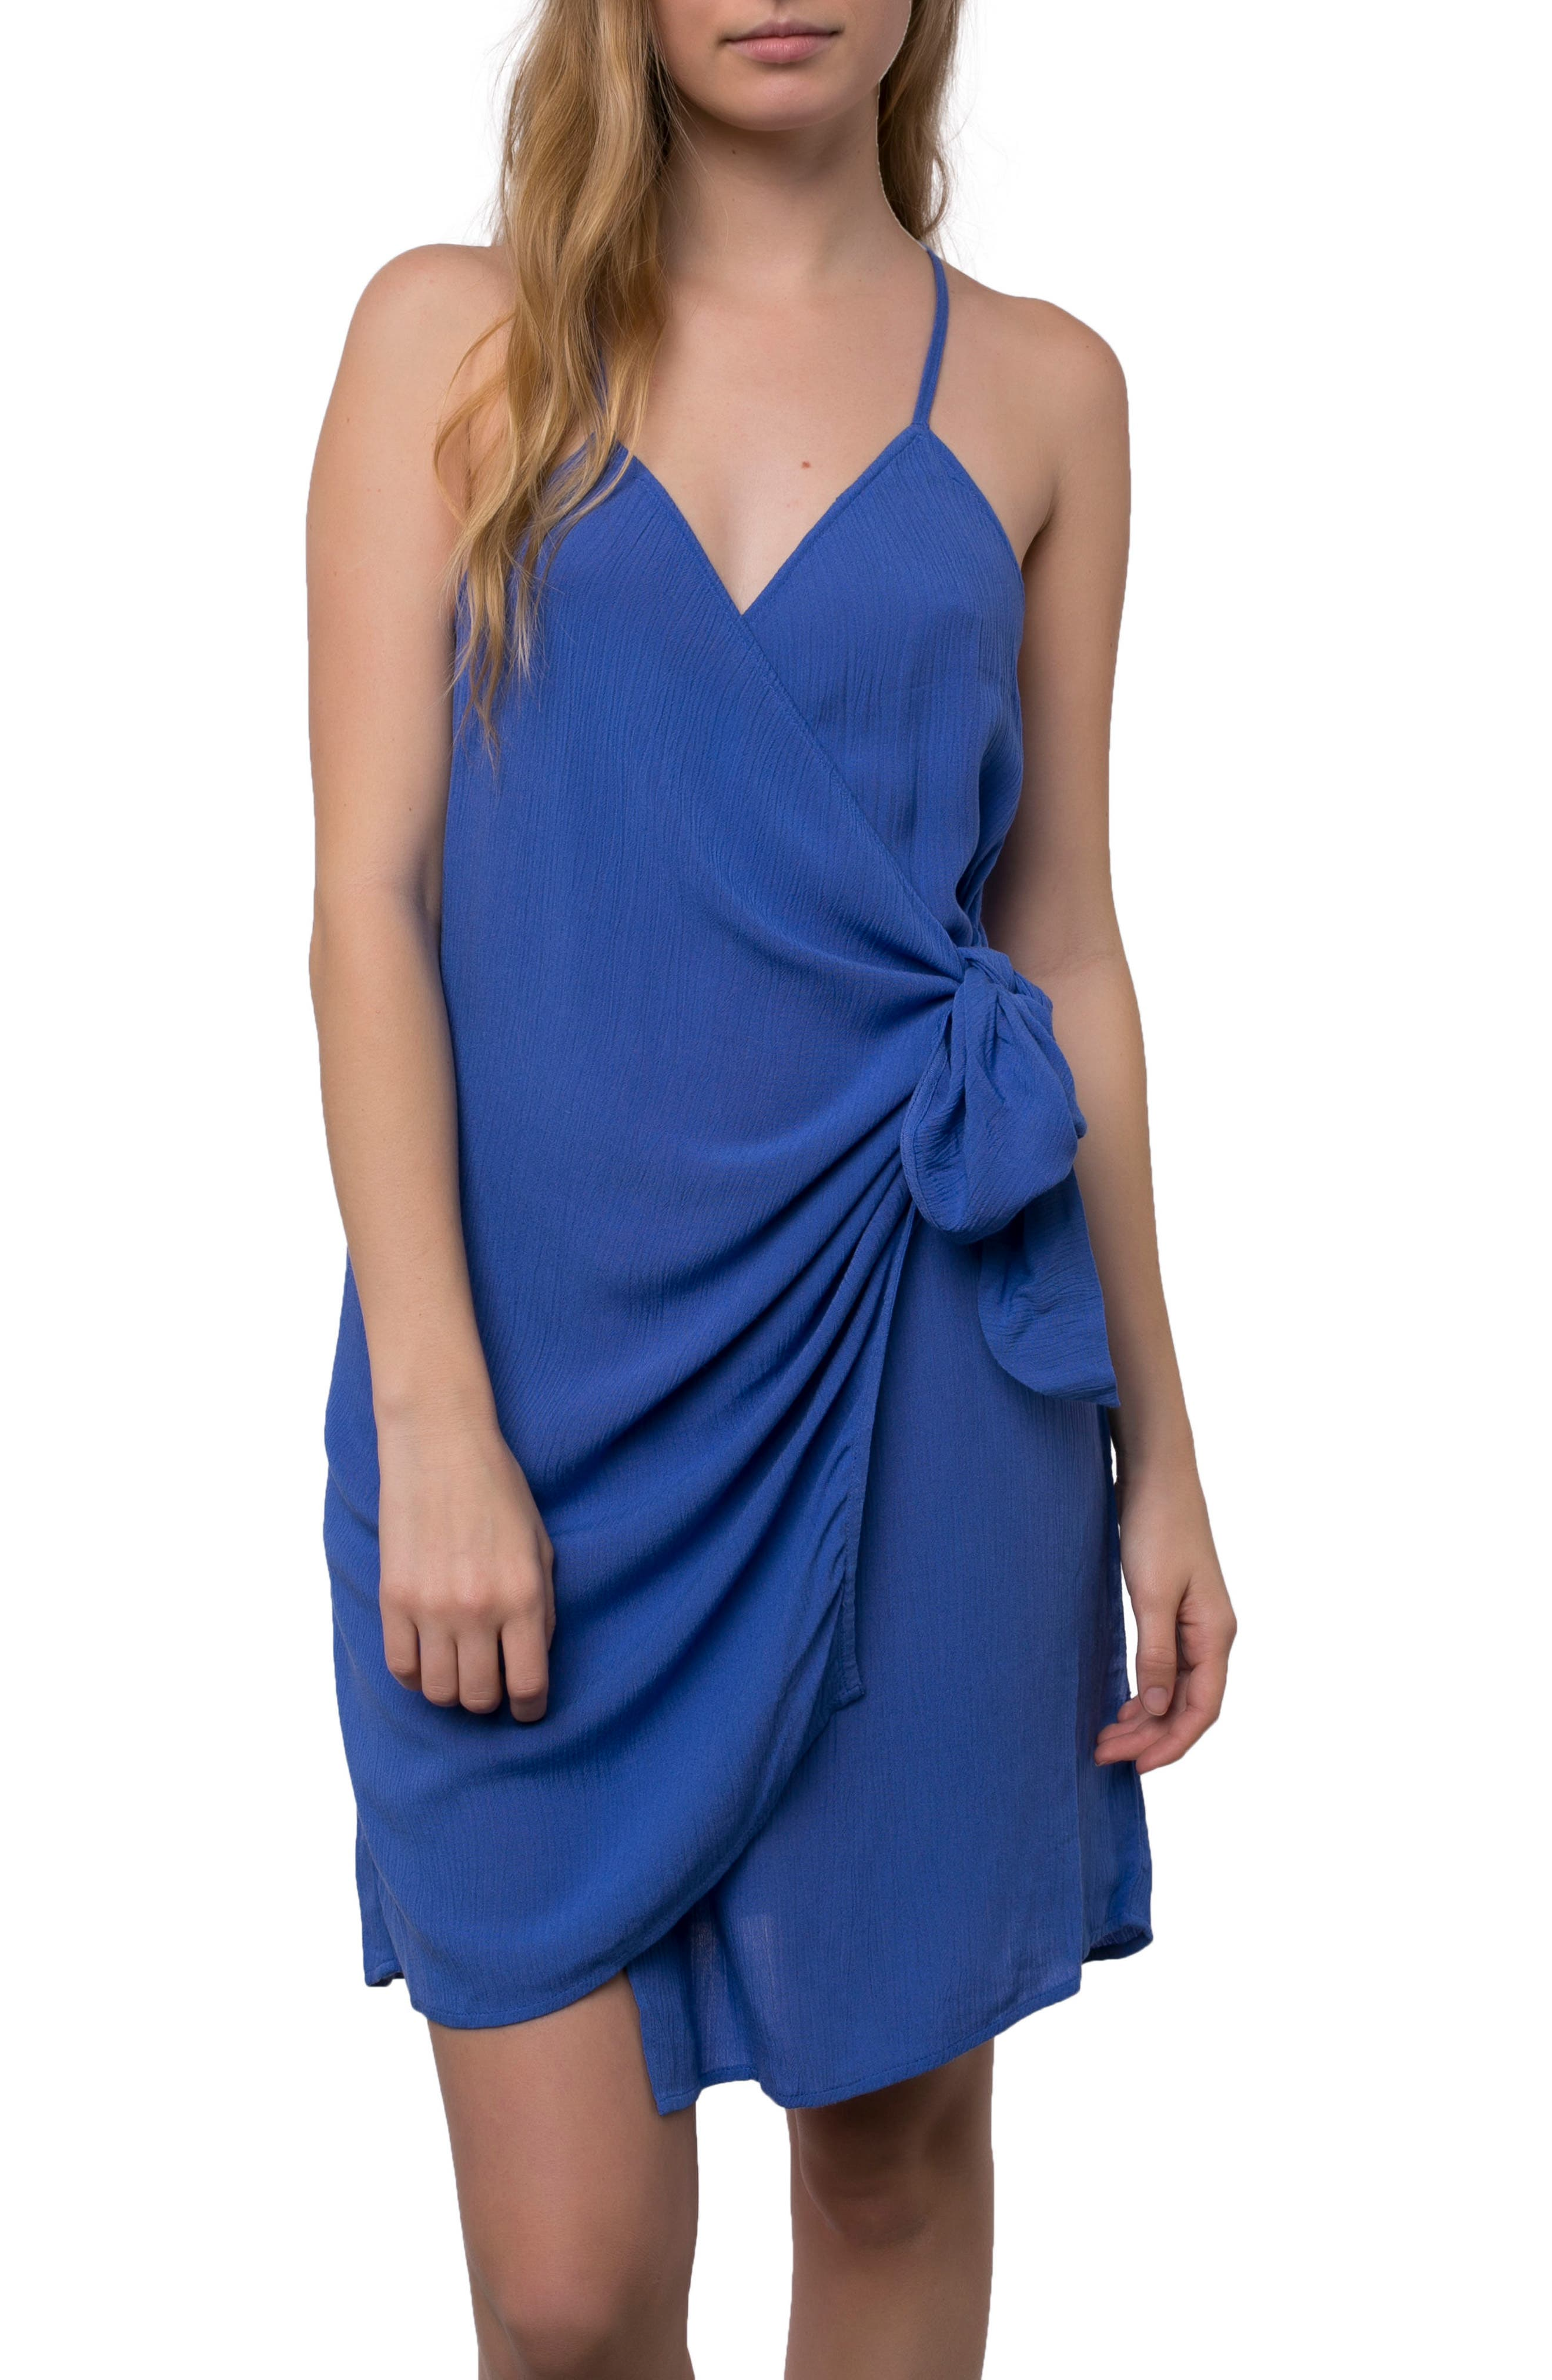 O'NEILL Marlo Wrap Dress, Main, color, 435